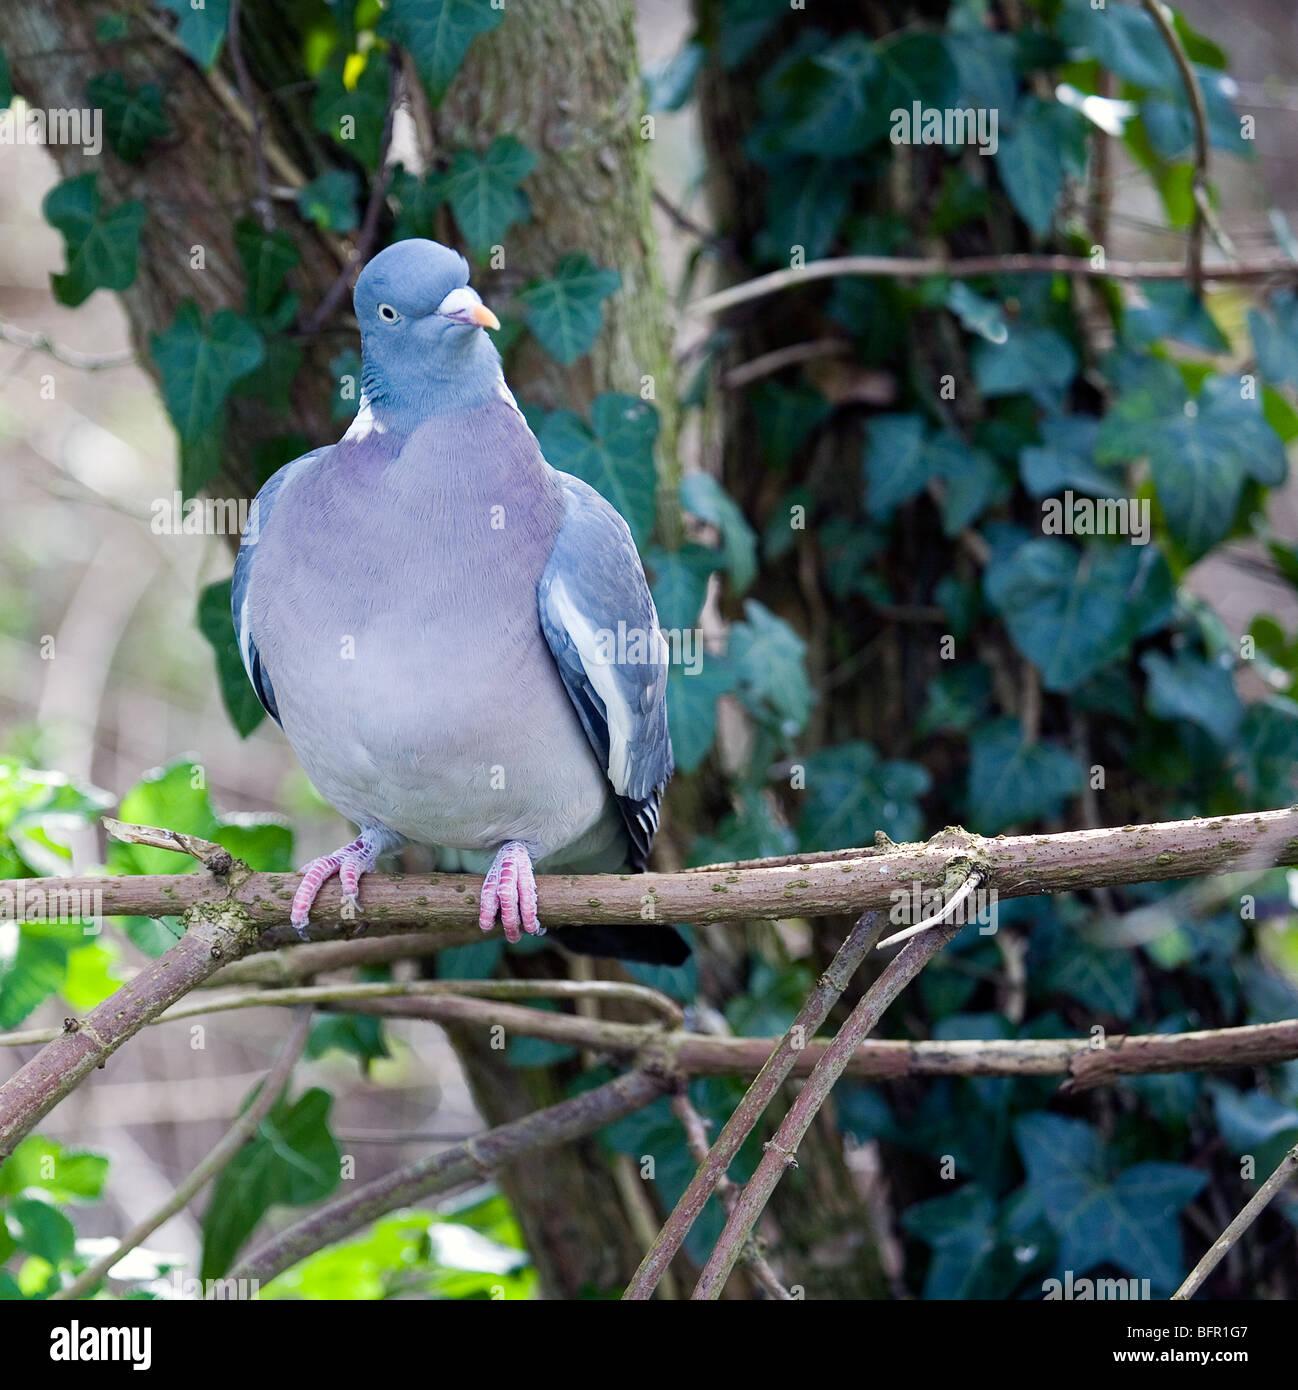 Wood Pigeon (Columba palumbus) perched in tree - Stock Image